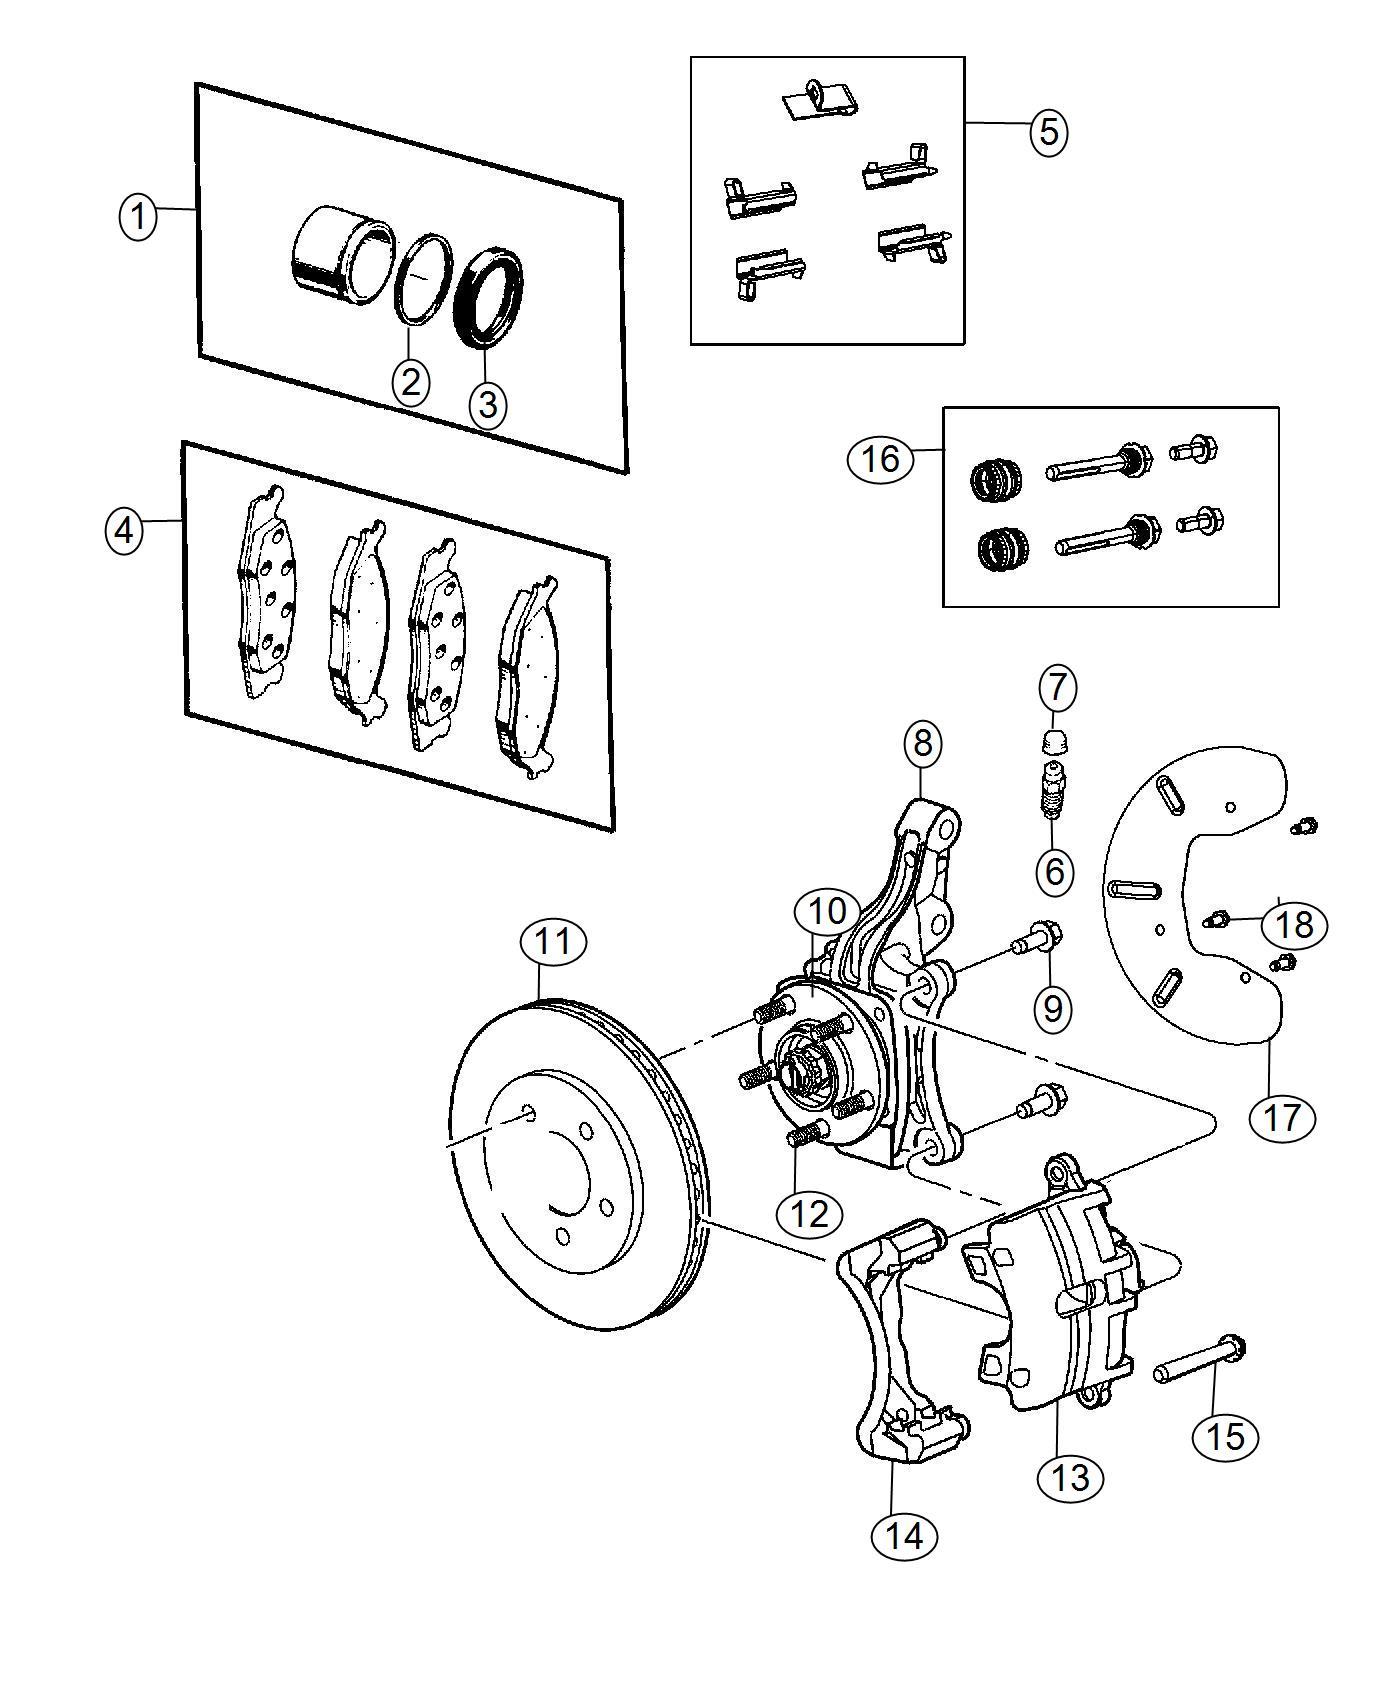 Chrysler 200 Rotor. Brake. Front. Magneti marelli